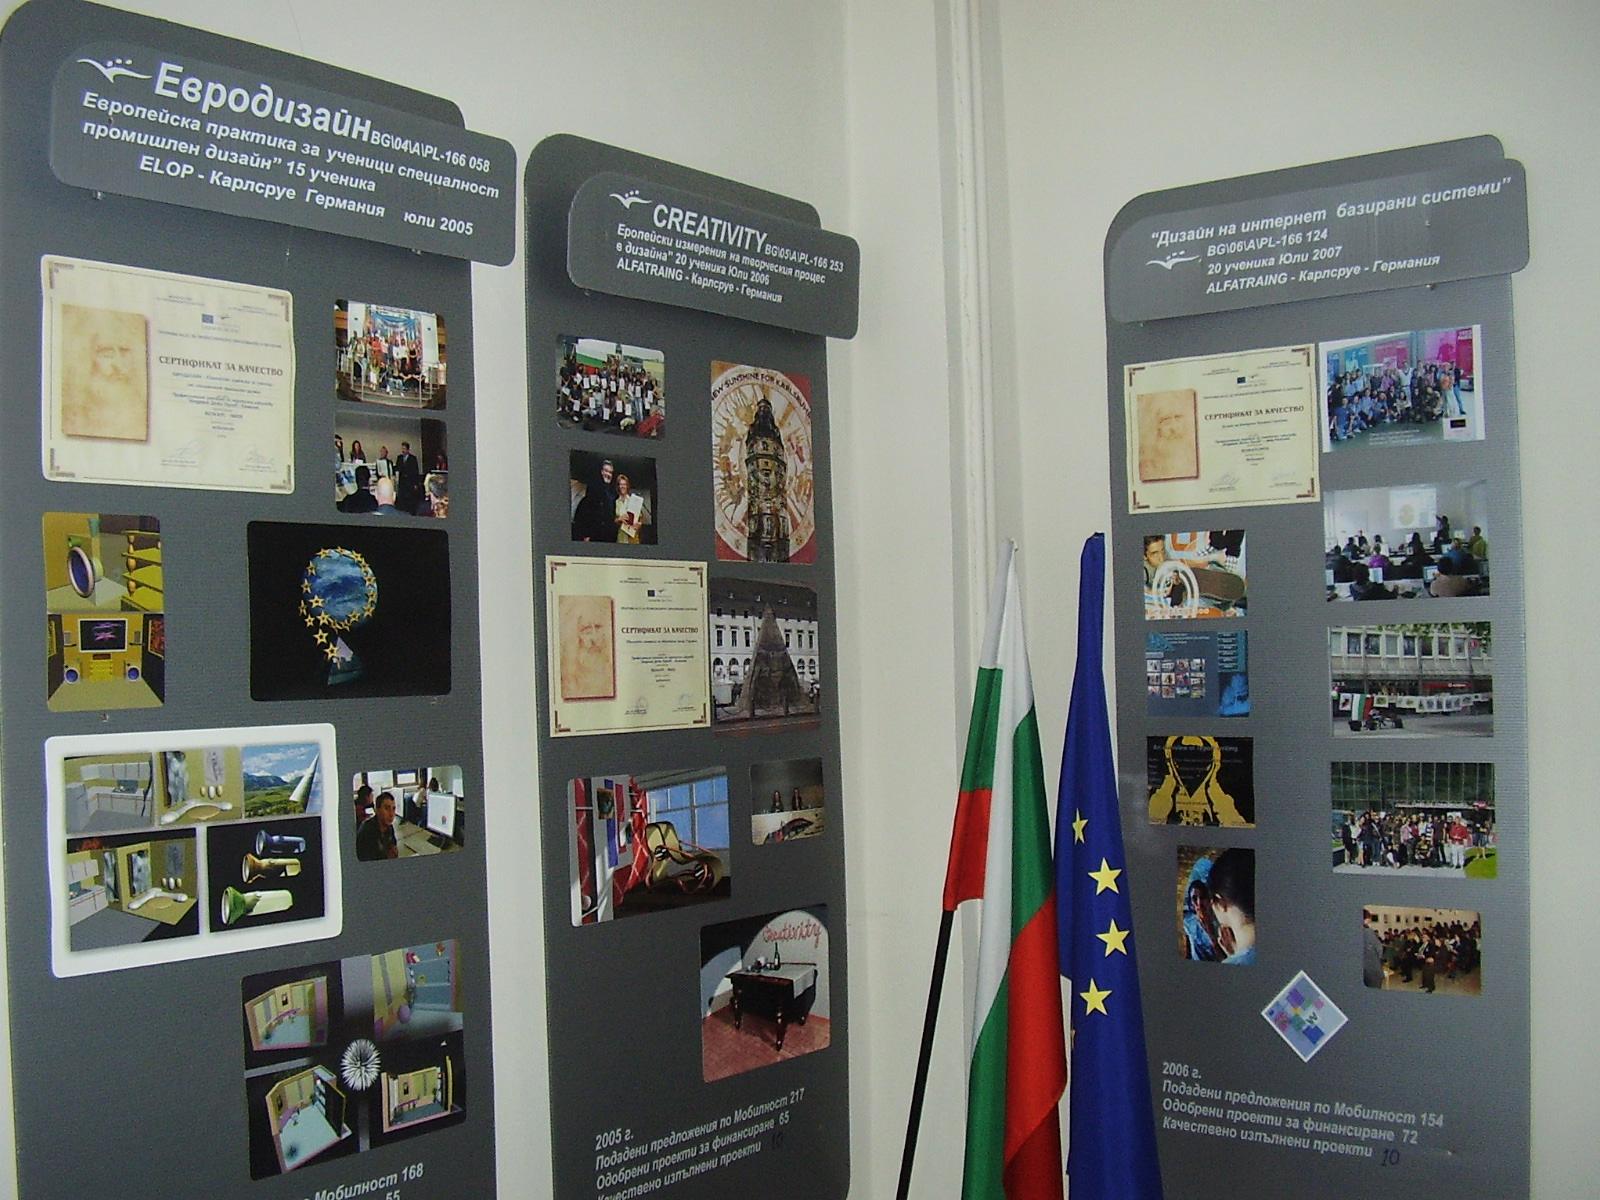 EU PROJECTS SCHOOL PANEL